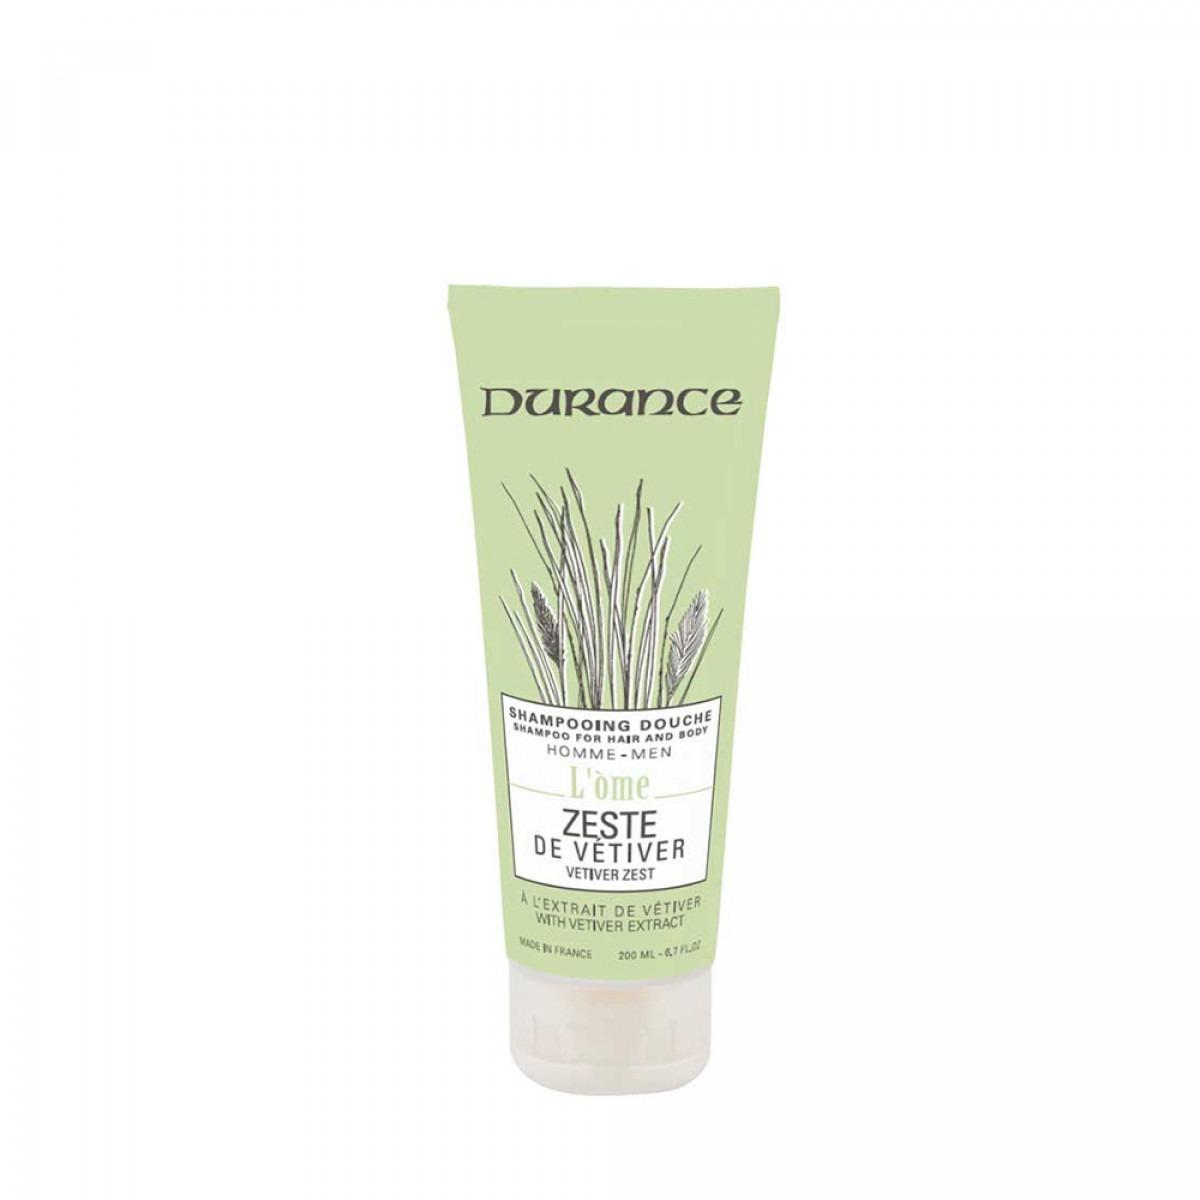 Durance L'Ome Vetiver Zest Hair & Body Shampoo 200ml